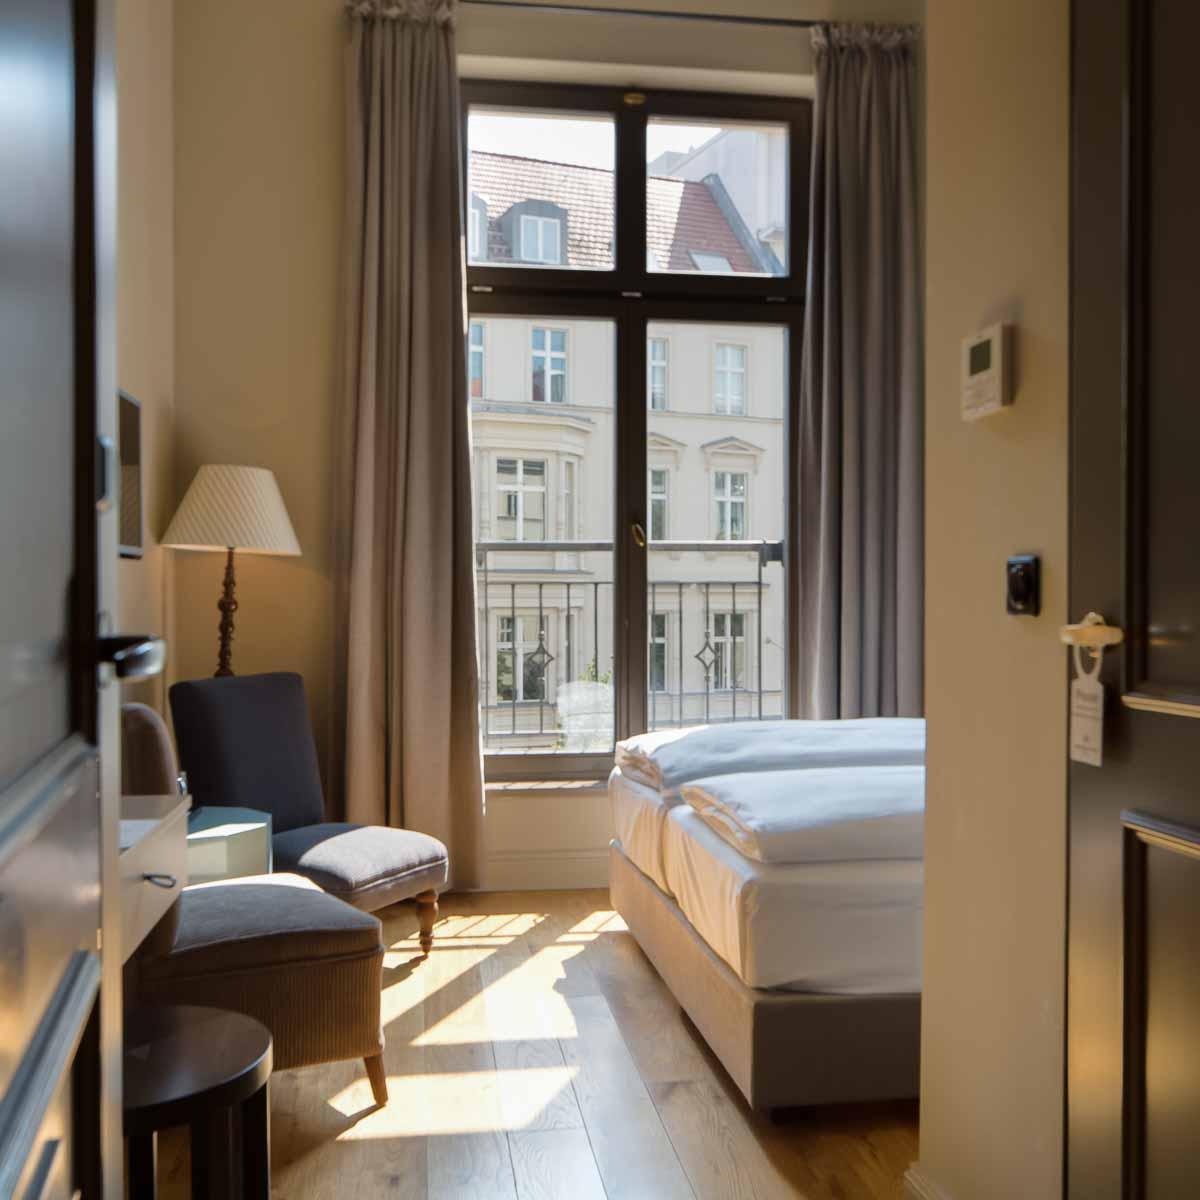 Monbijou Hotel in Berlin-Mitte-8